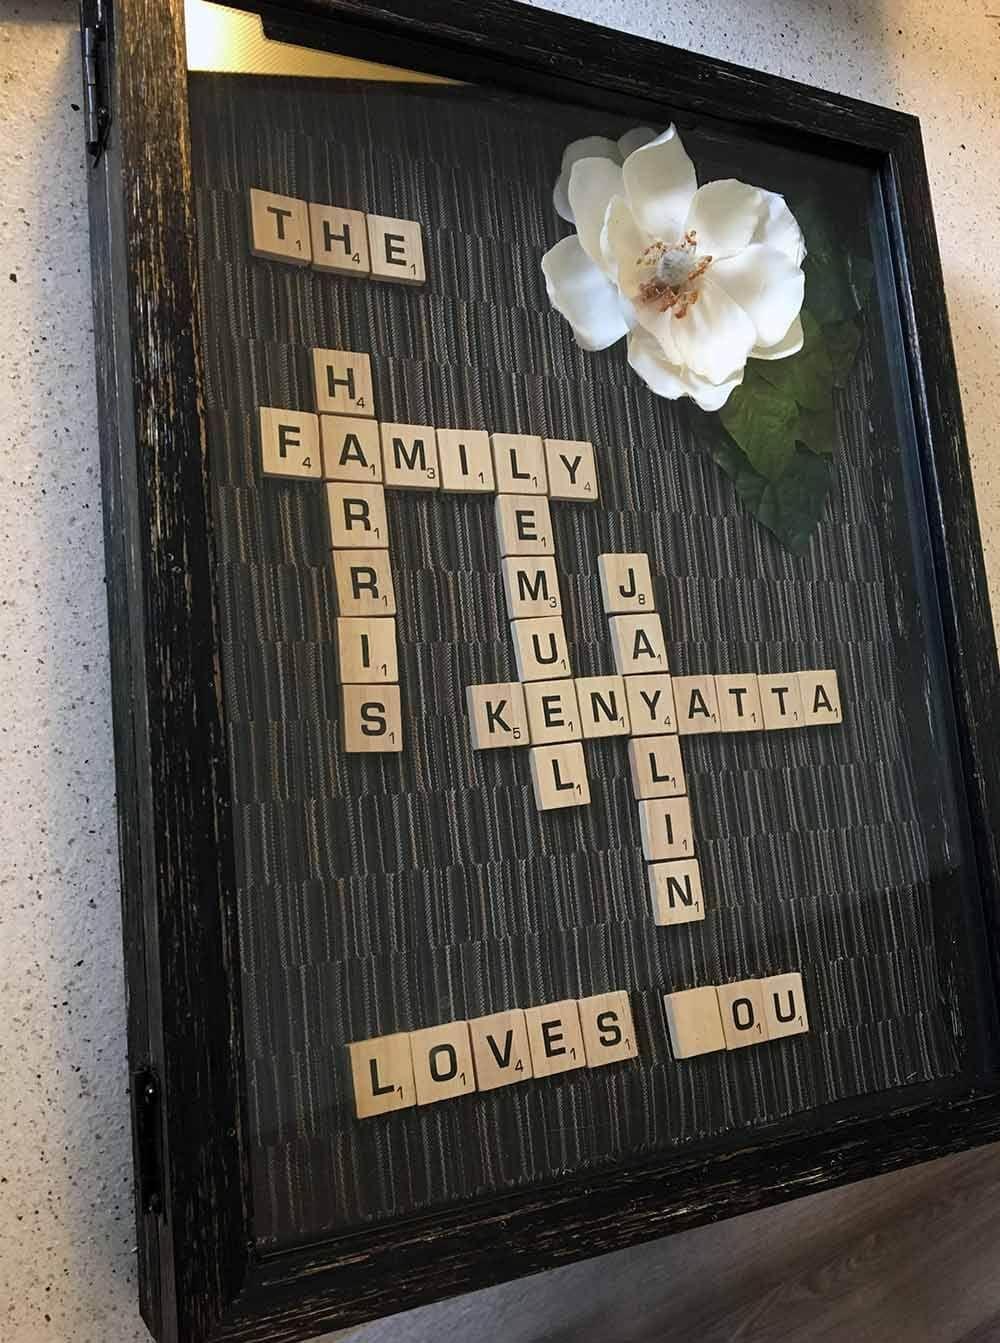 6 Diy Sentimental Gifts For Mother S Day Diy Gifts For Mothers Sentimental Gifts Mother S Day Diy